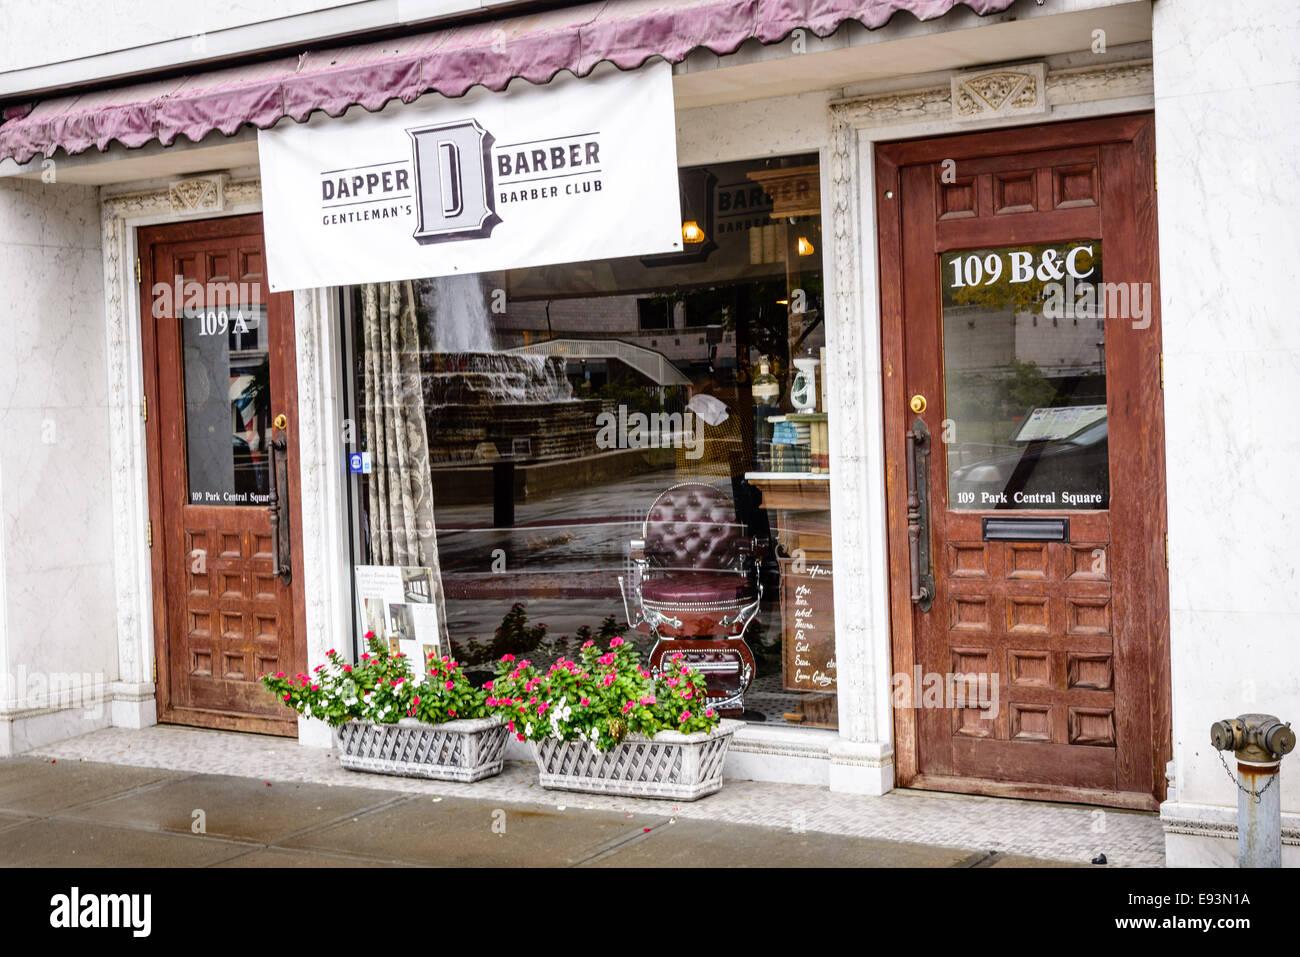 Dapper Barber, 109 Park Central Square, Springfield, Missouri - Stock Image